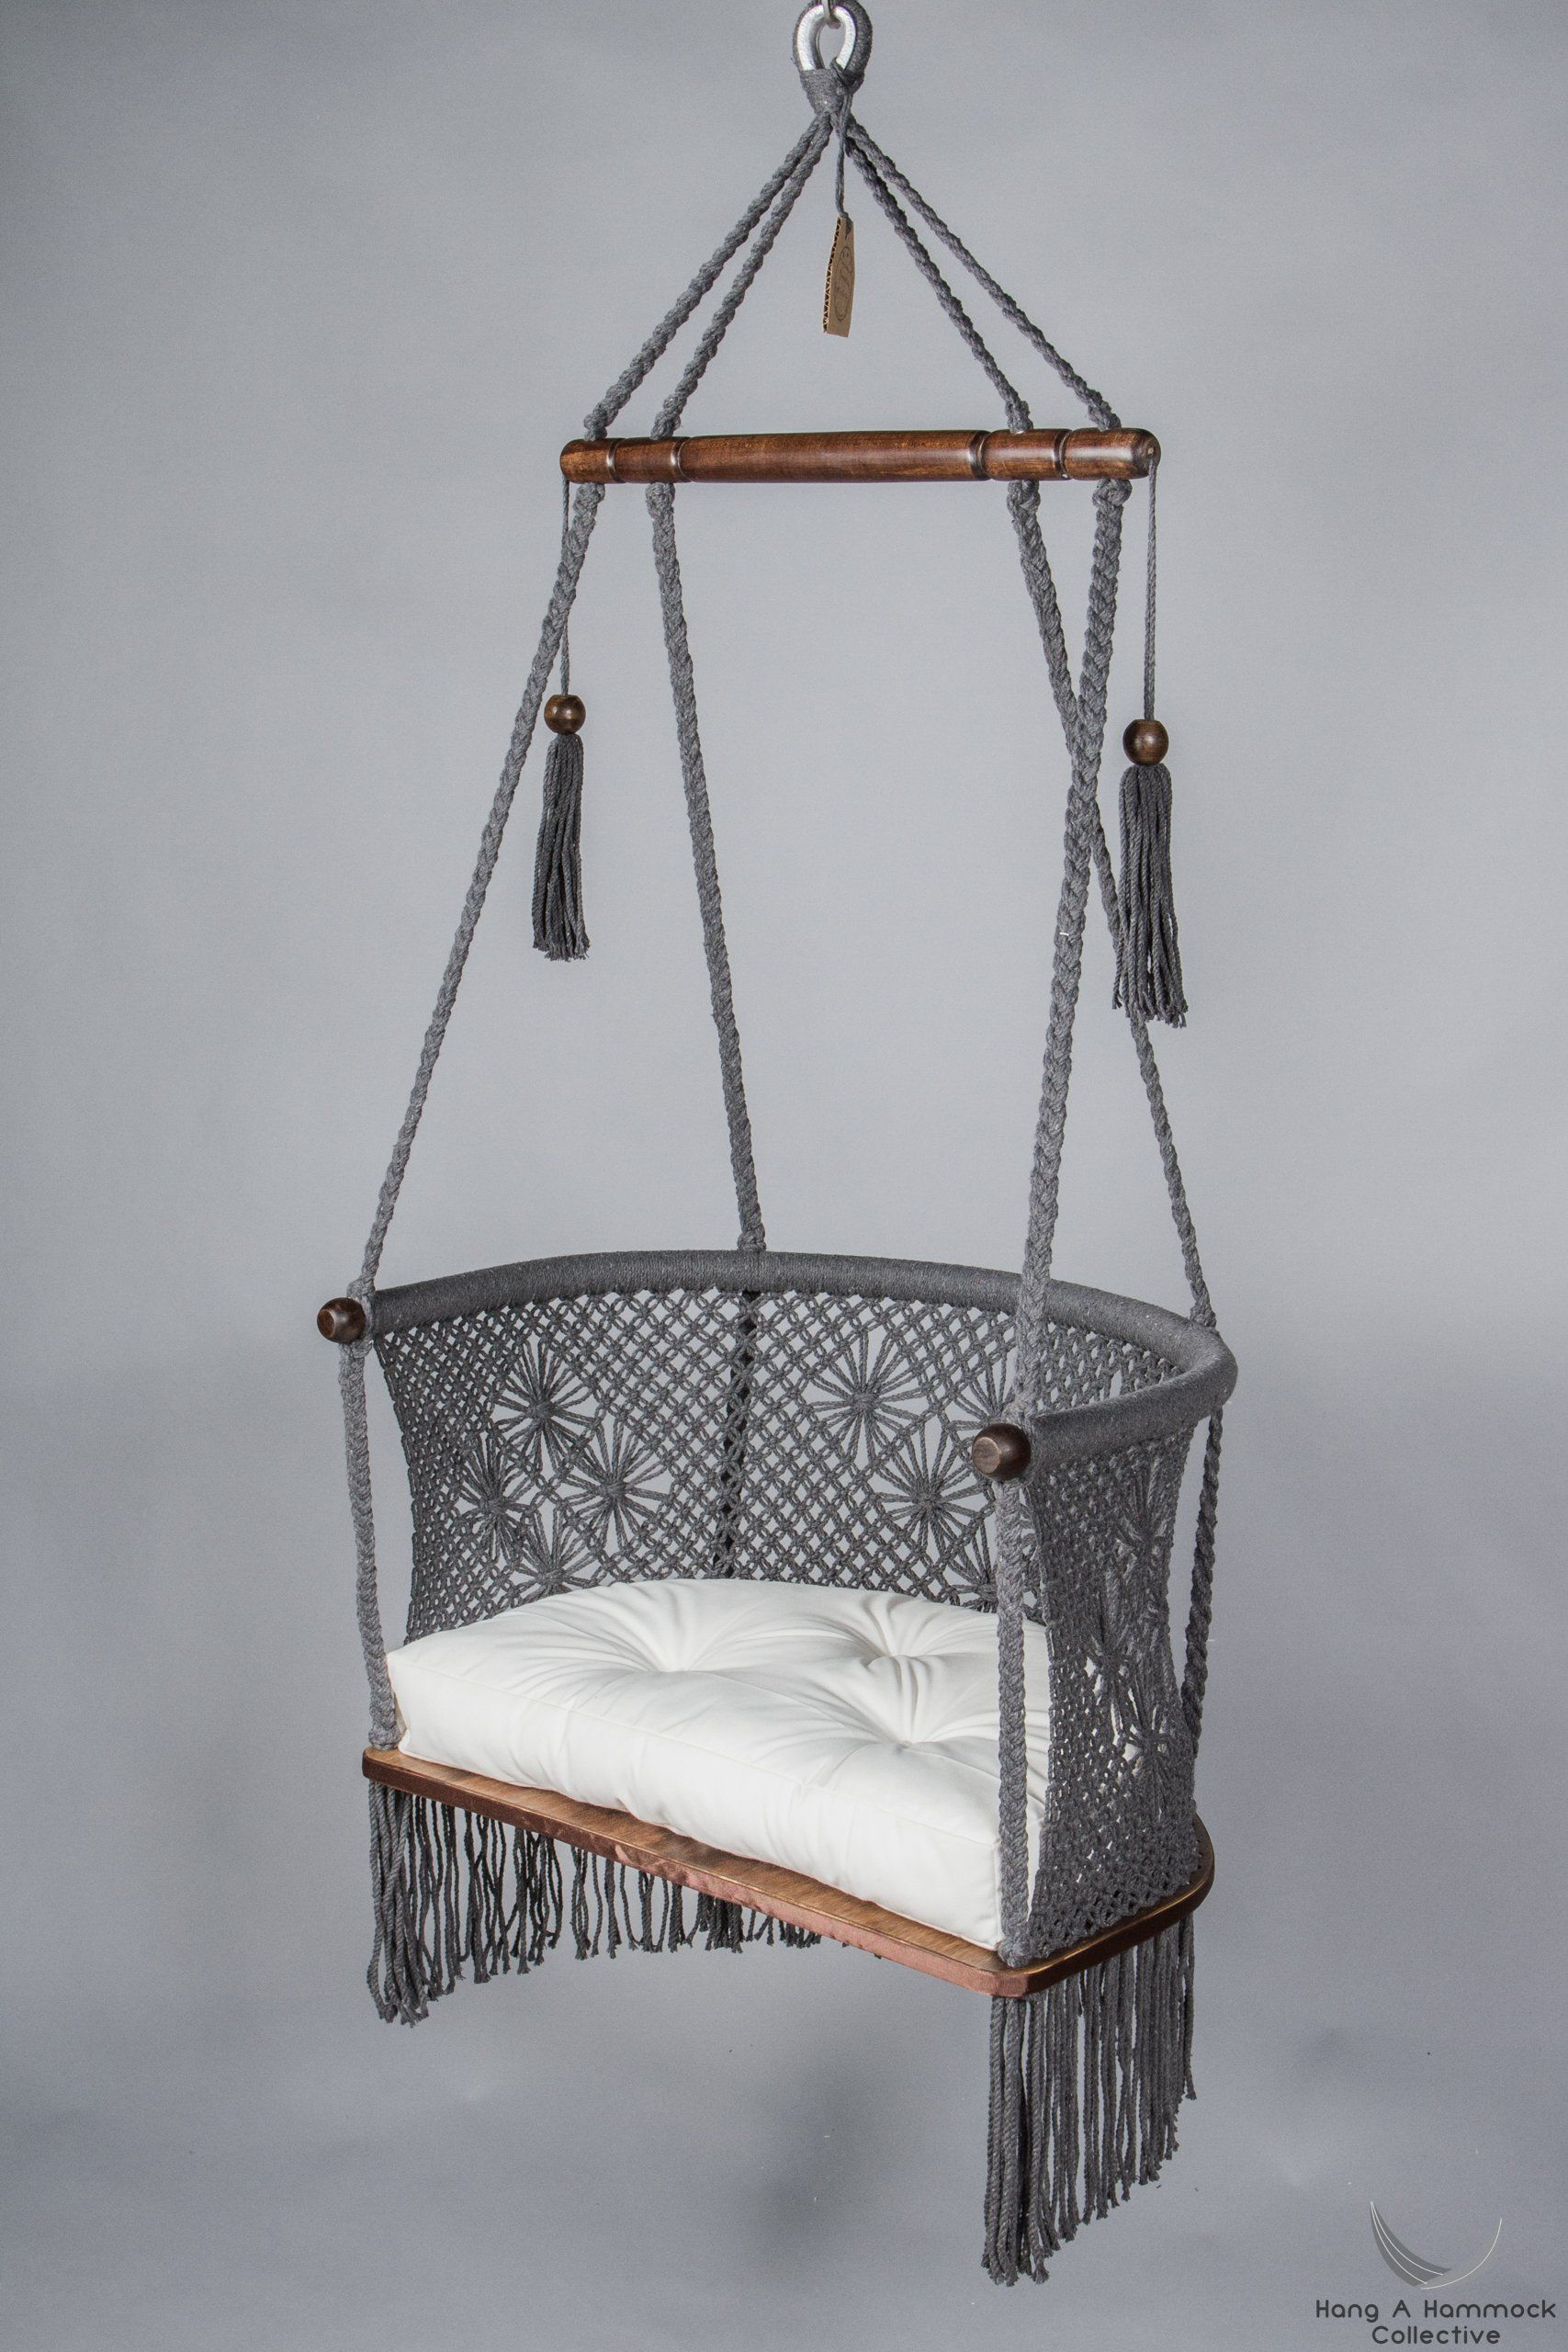 cream collections chair macrame swing dark chairs handmade hanging lifestyle wood hammocks